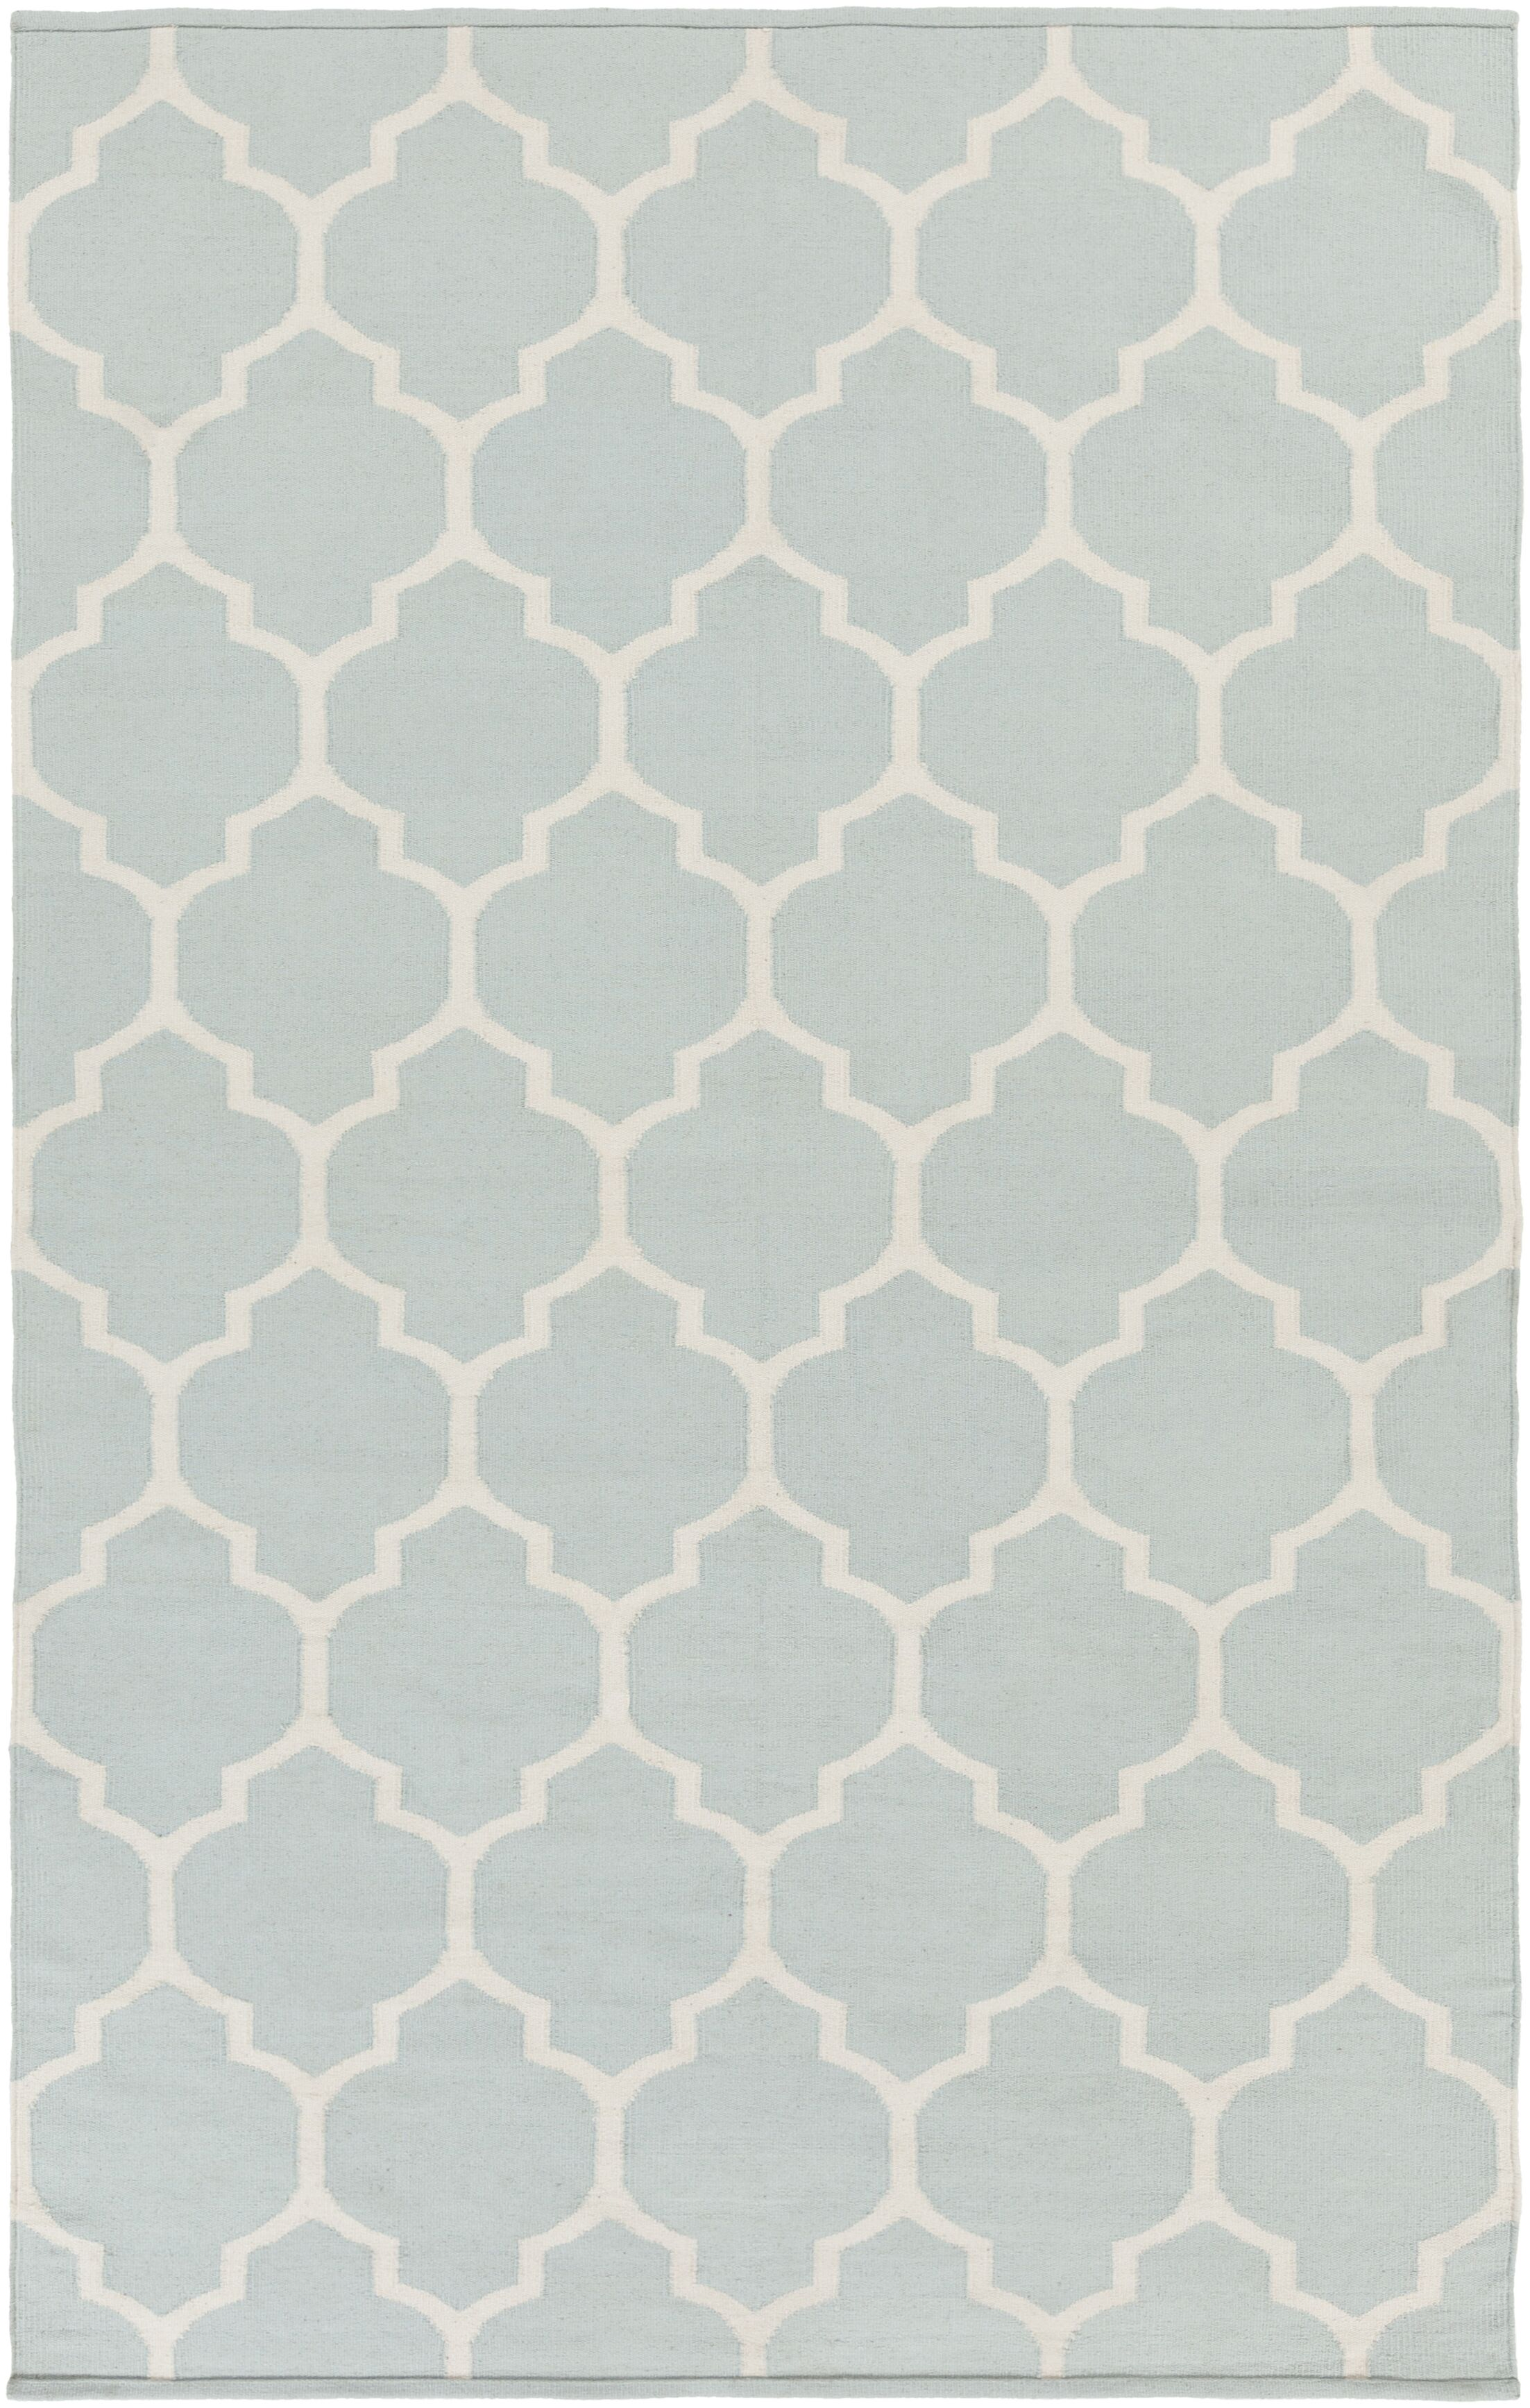 Bohannon Handmade Gray Geometric Area Rug Rug Size: Rectangle 8' x 10'